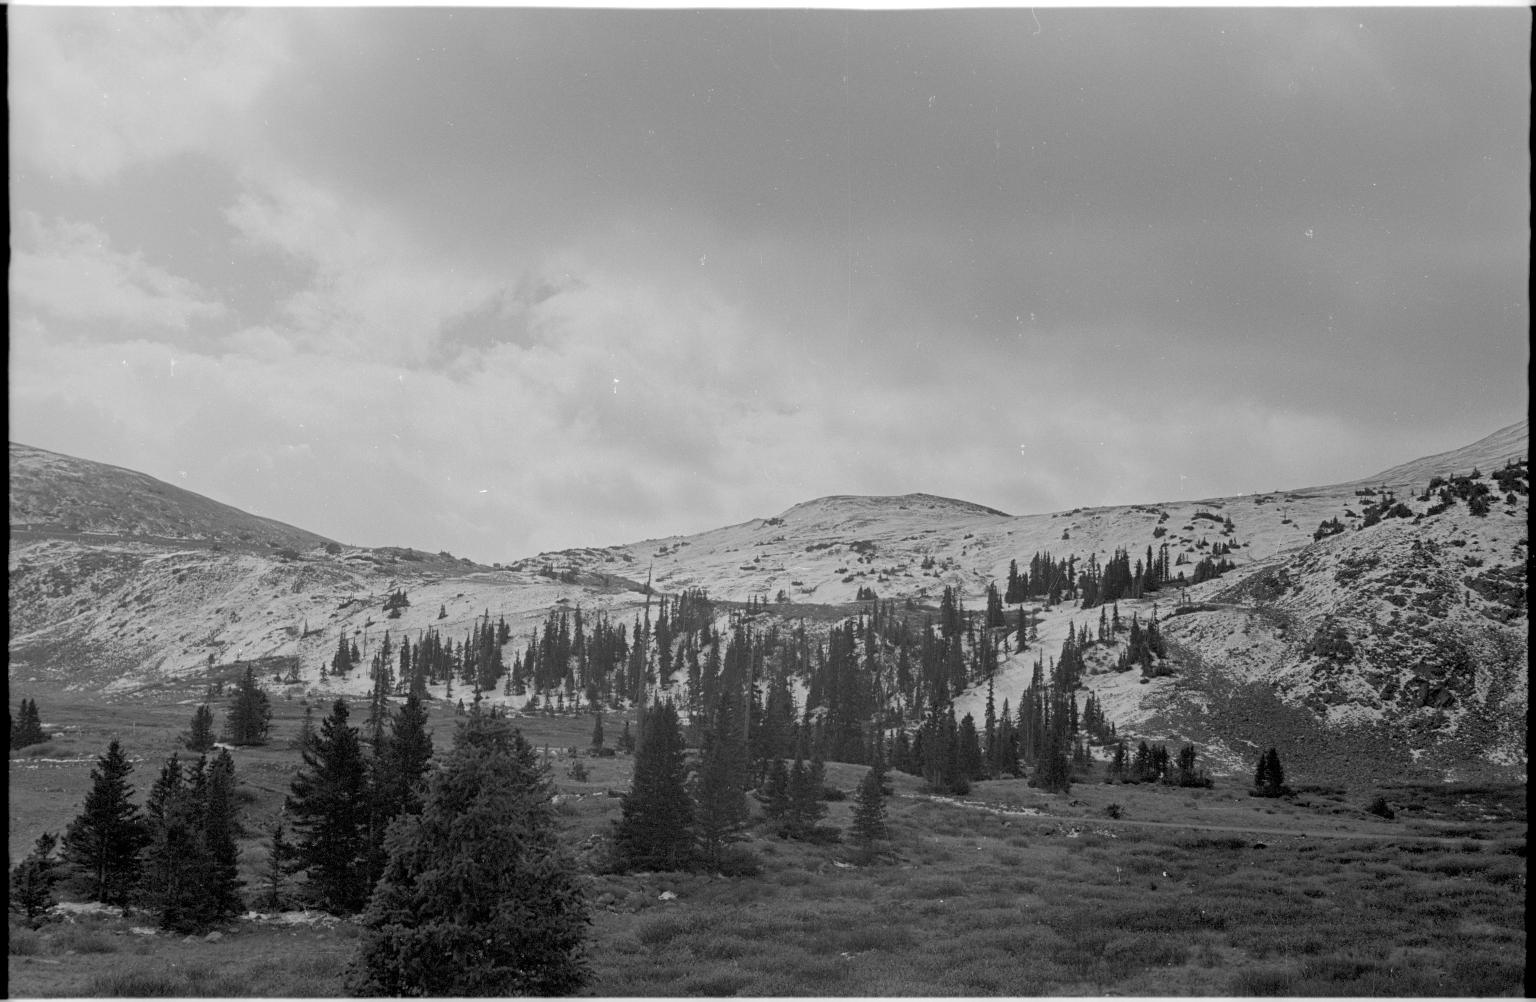 Cottonwood Pass Scenery